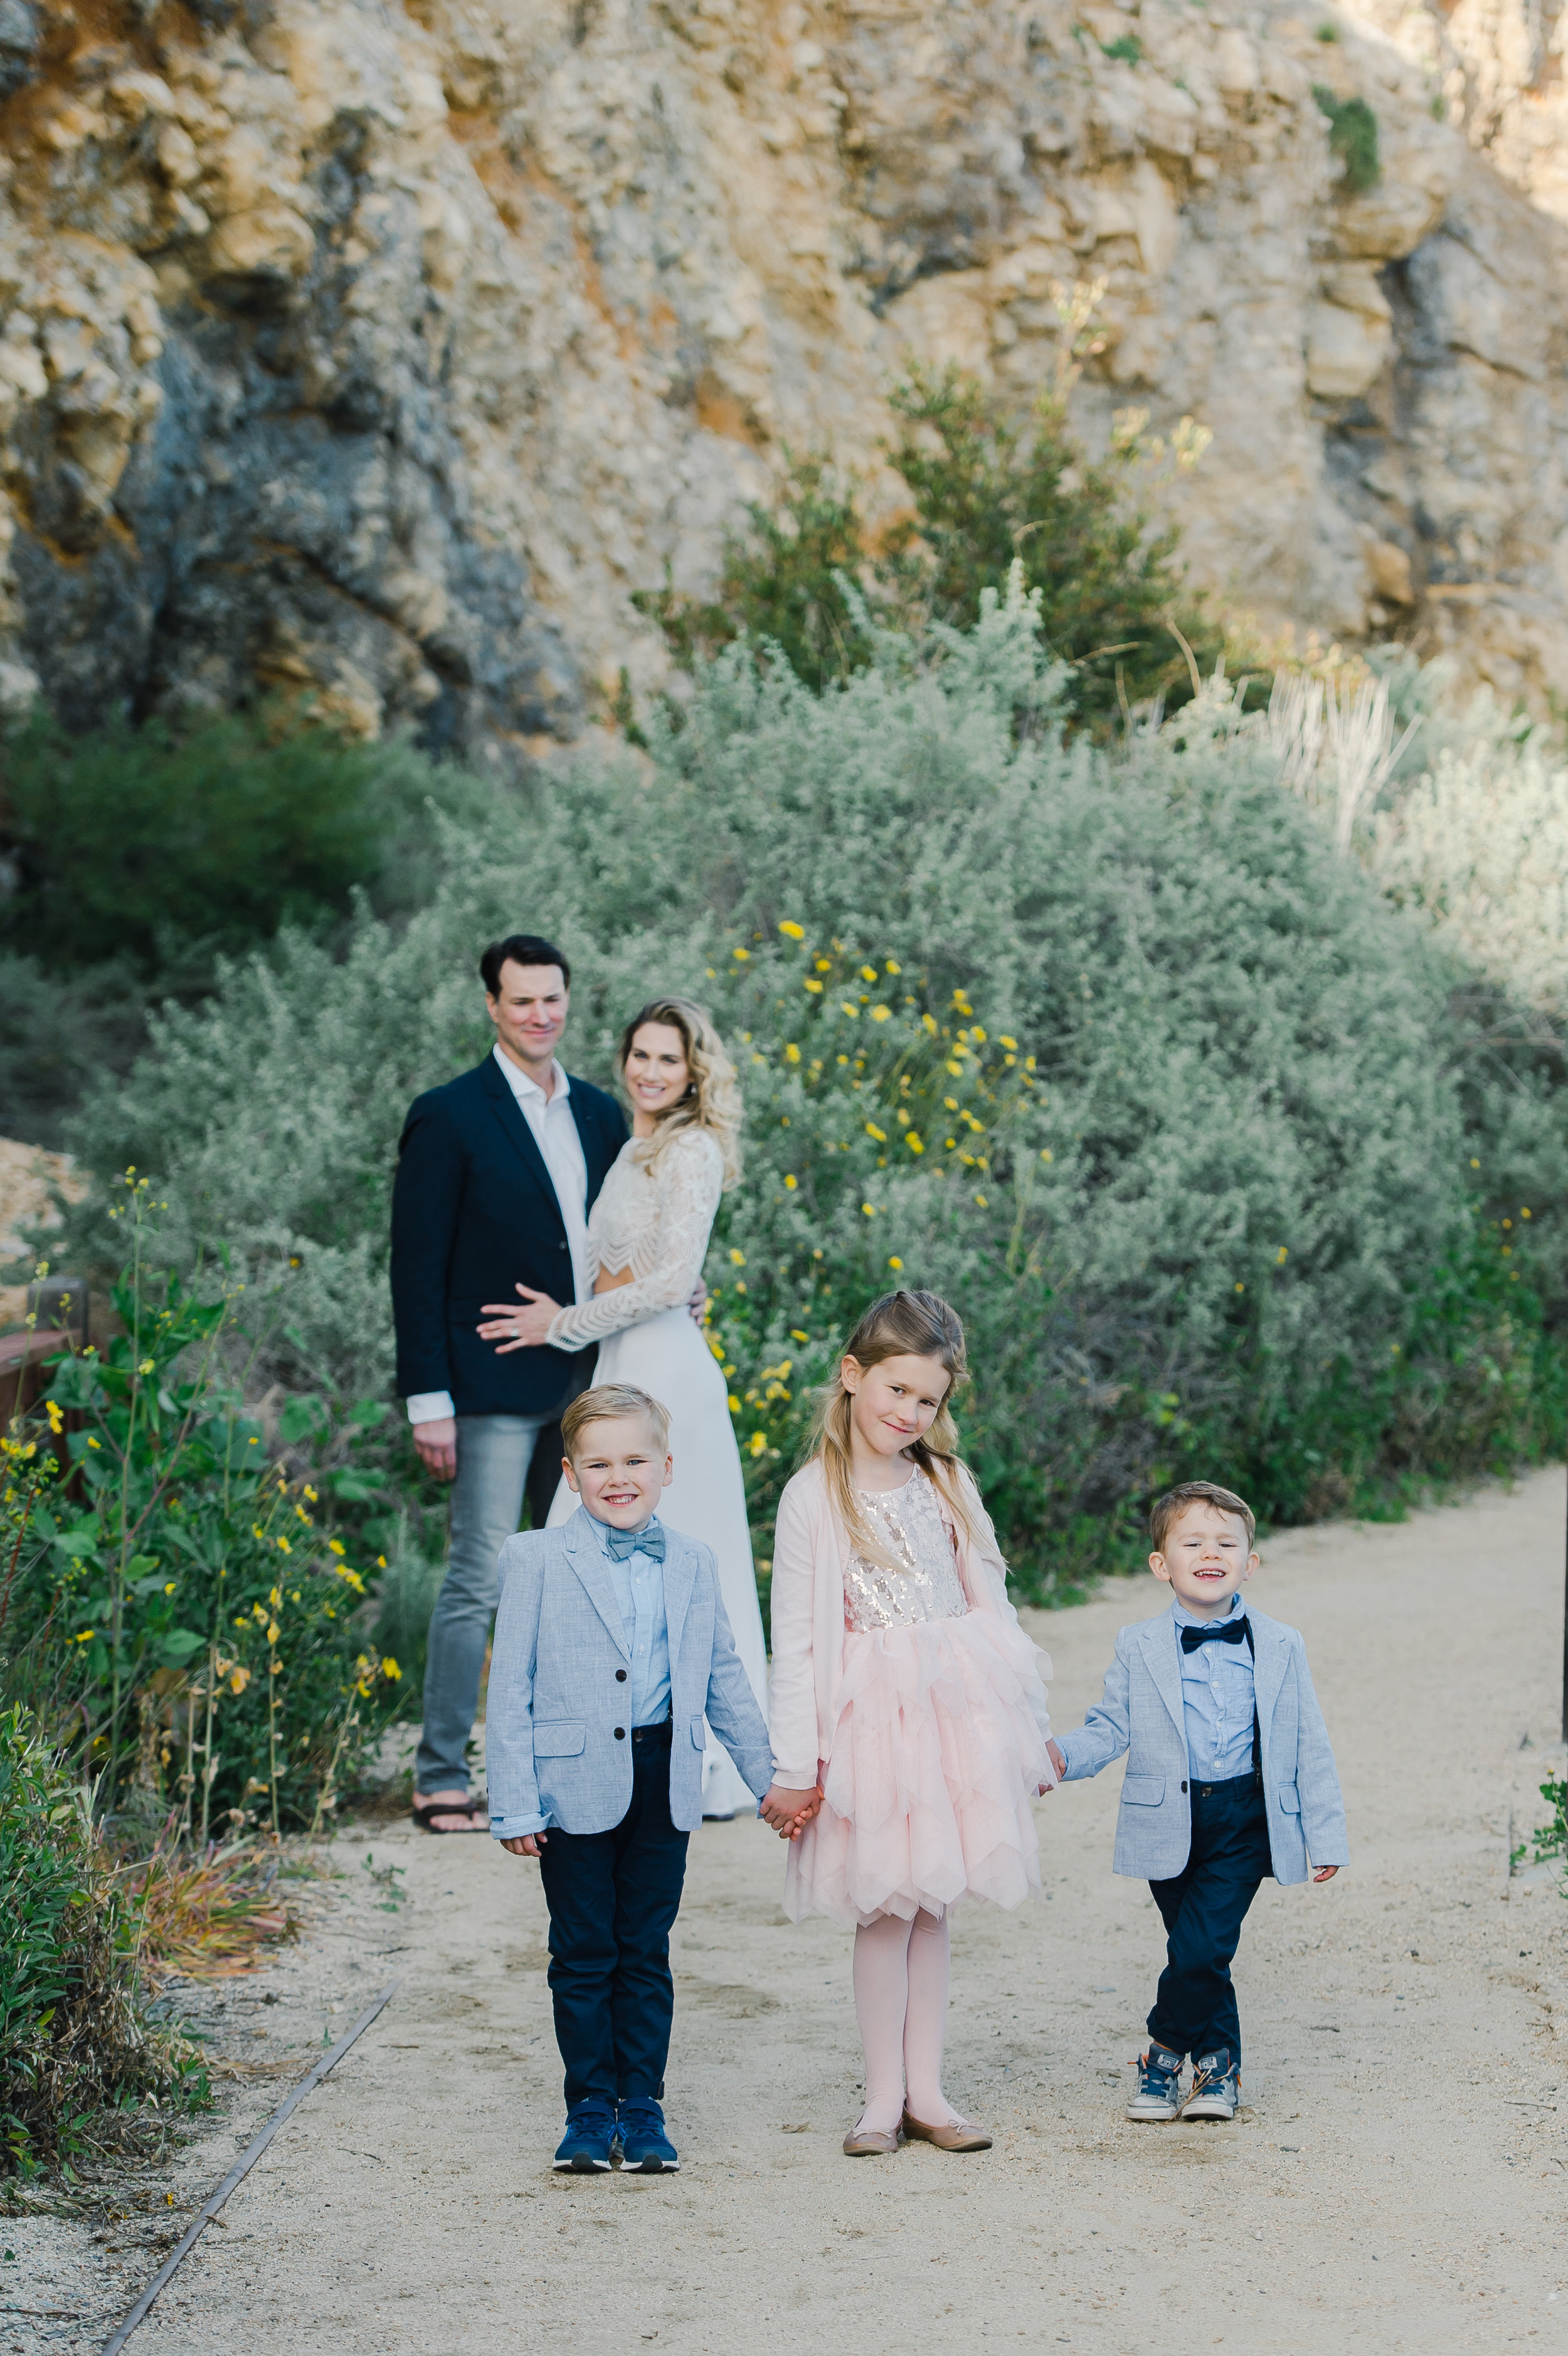 2terranearesortfamilyphotography.jpg